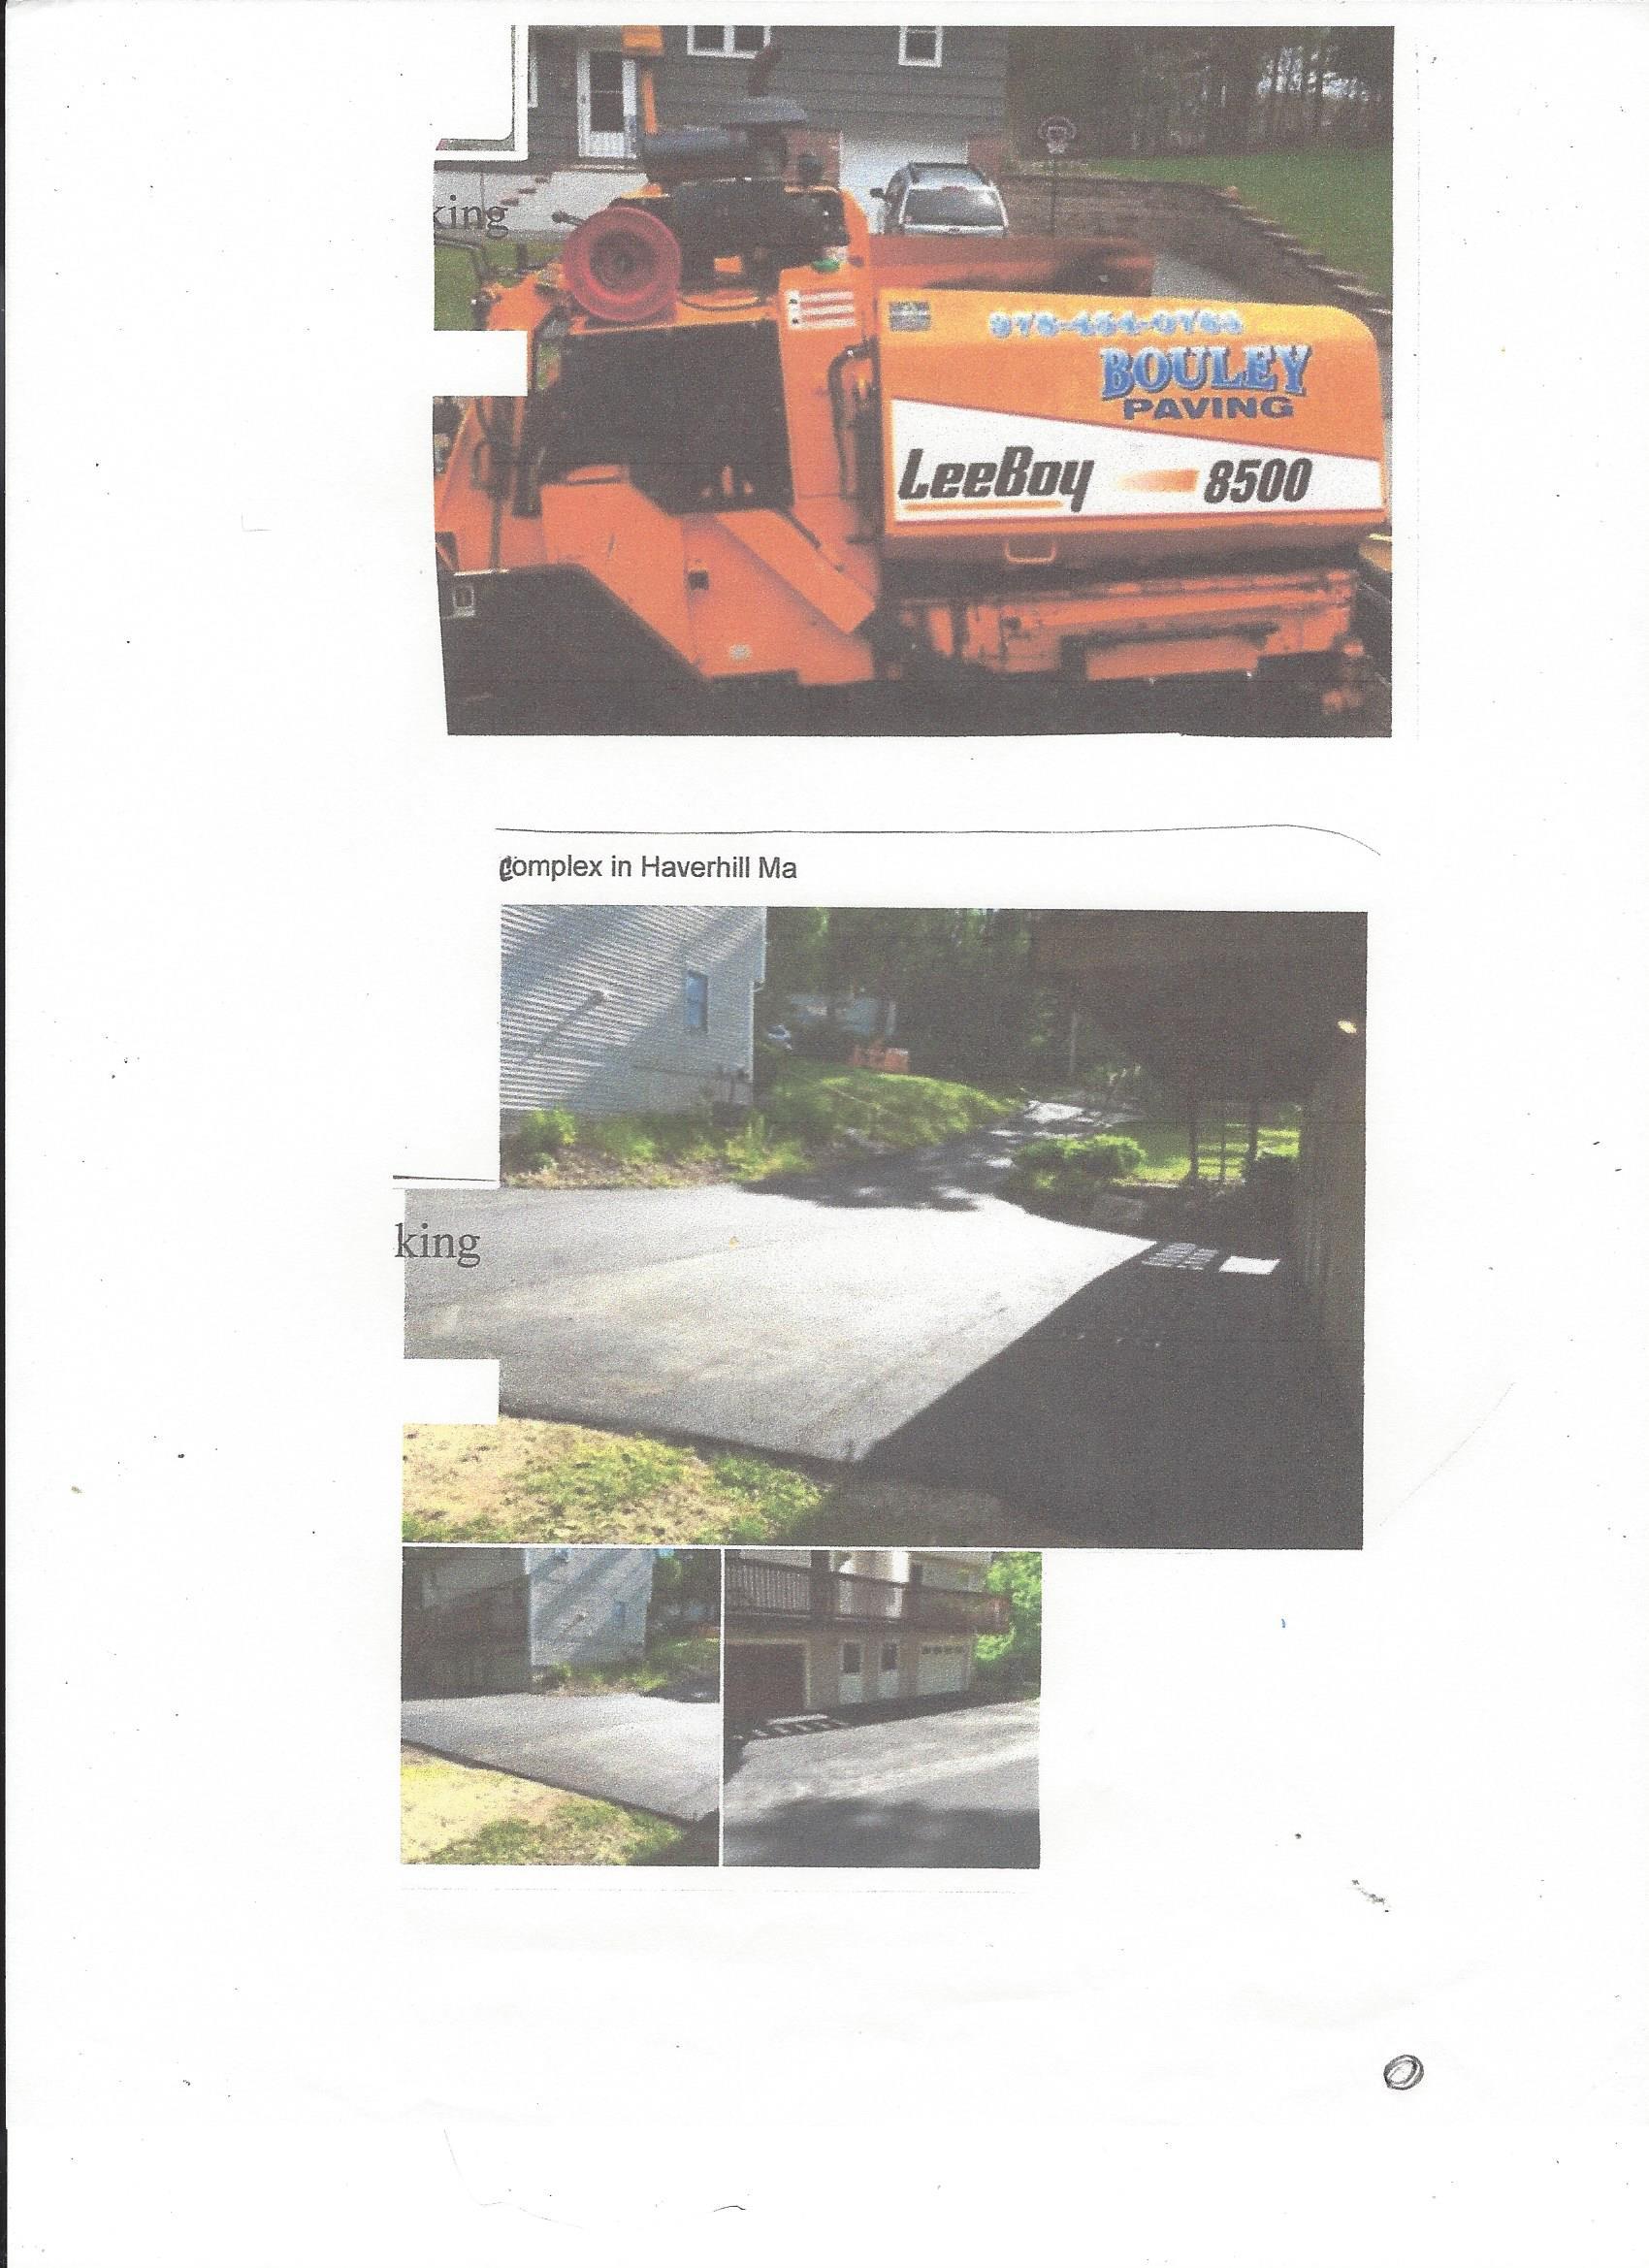 Bouley Trucking & Paving image 1